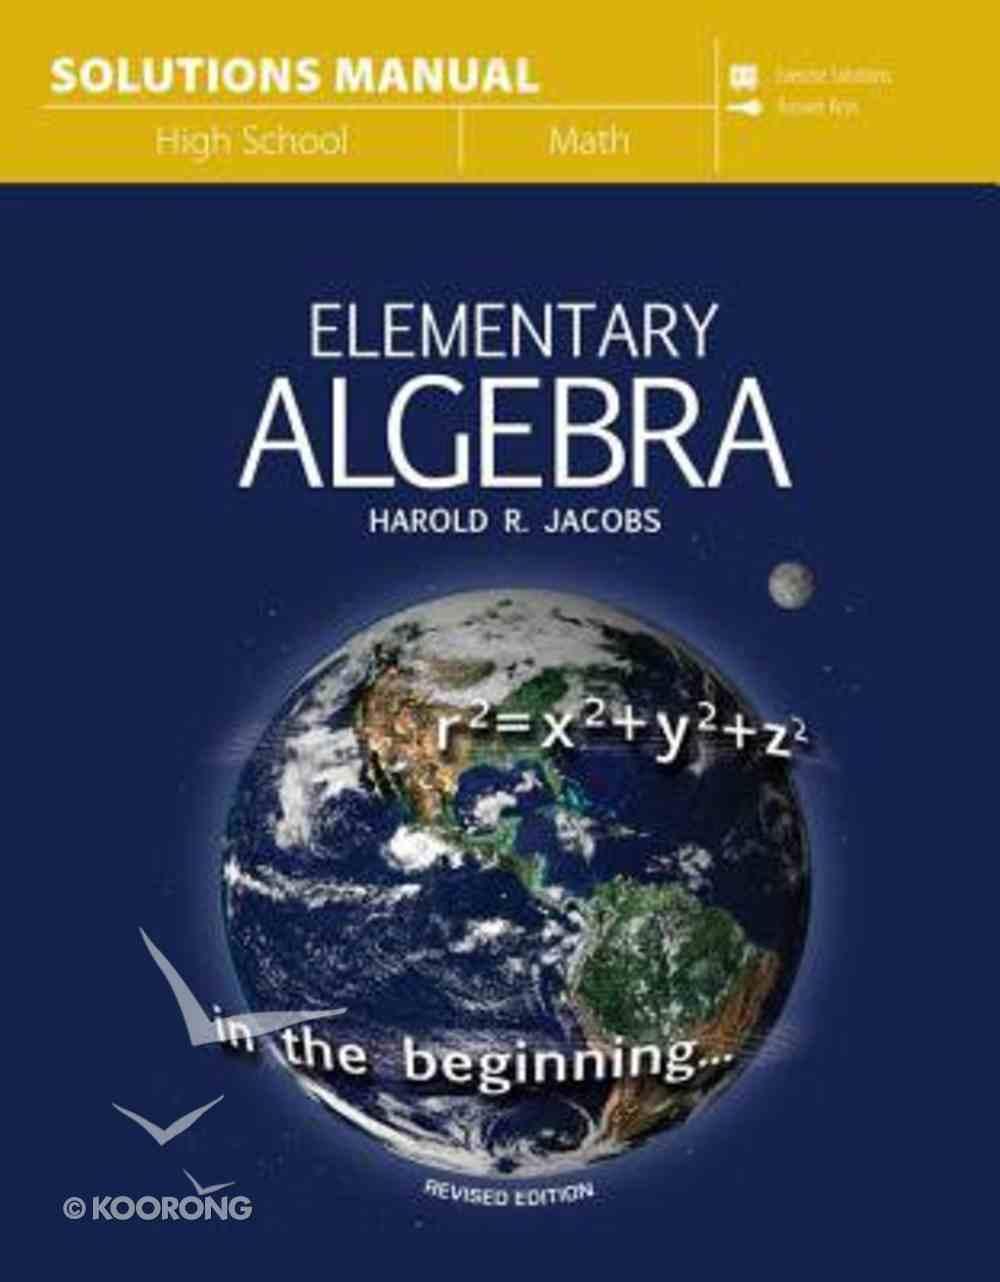 Elementary Algebra Solutions Manual Paperback